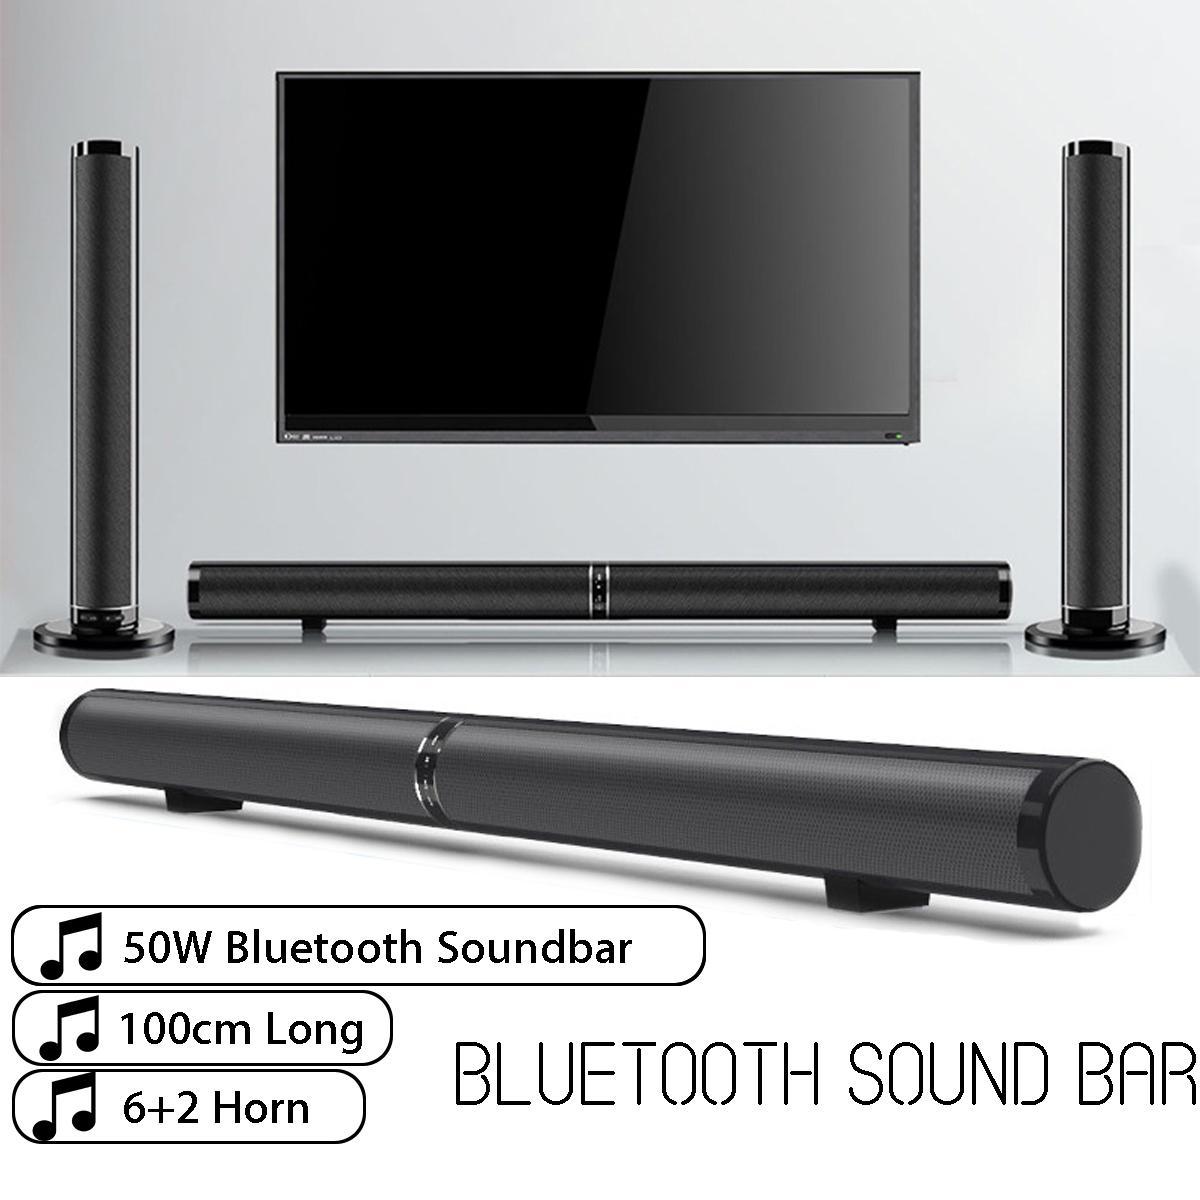 EU US Detachable Bluetooth Soundbar 50W Wireless Stereo Subwoofer Speaker TV Home Theater TF FM USB Virtual Surround Sound Bar